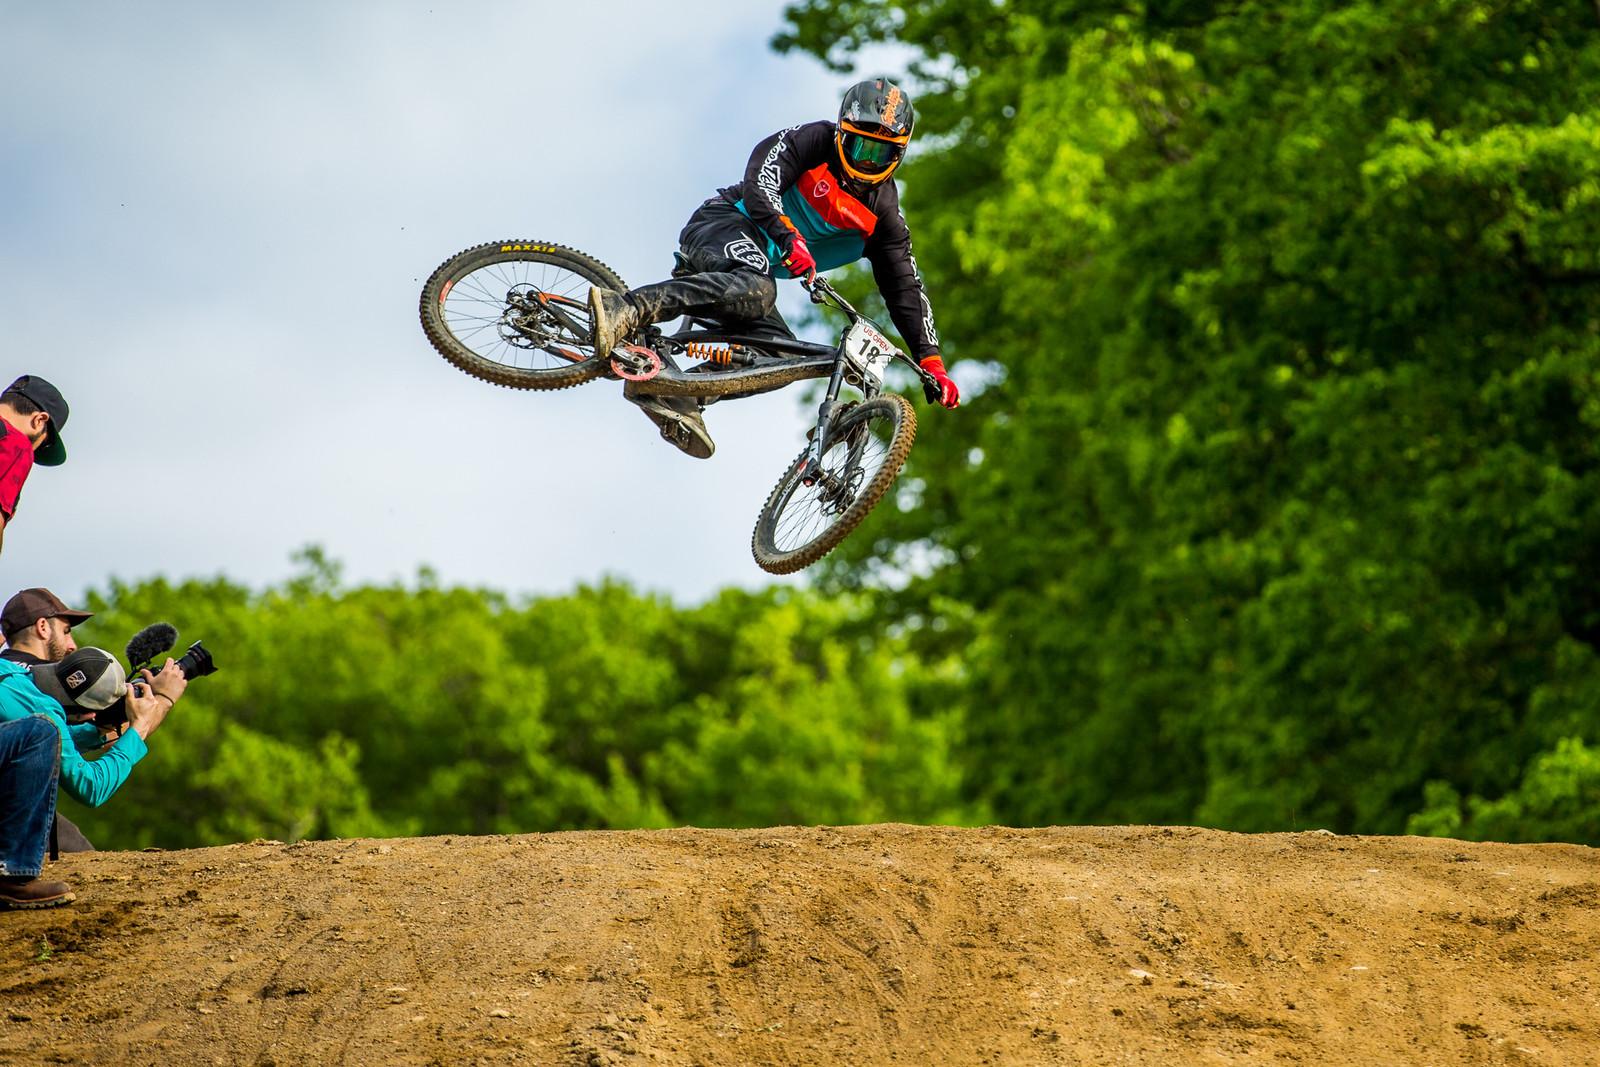 George Ryan - US Open Whip Off! - Mountain Biking Pictures - Vital MTB